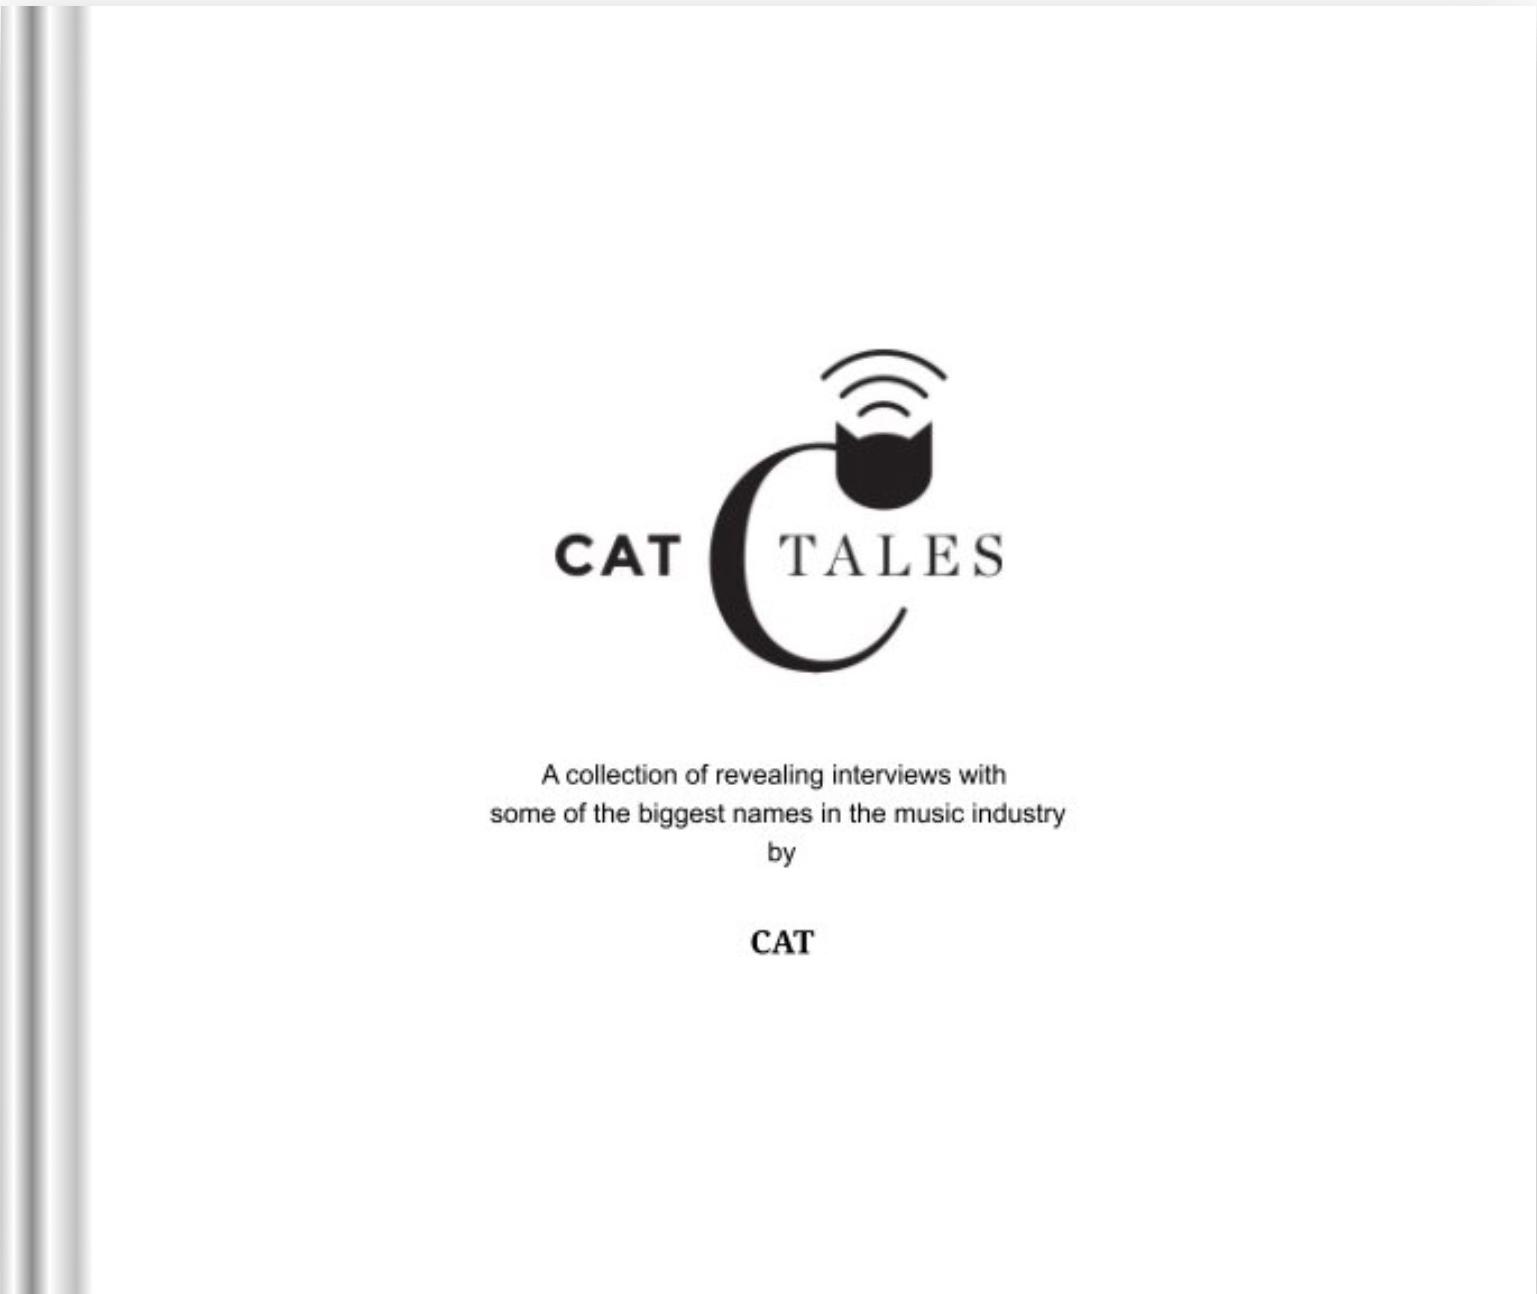 CATtales Book